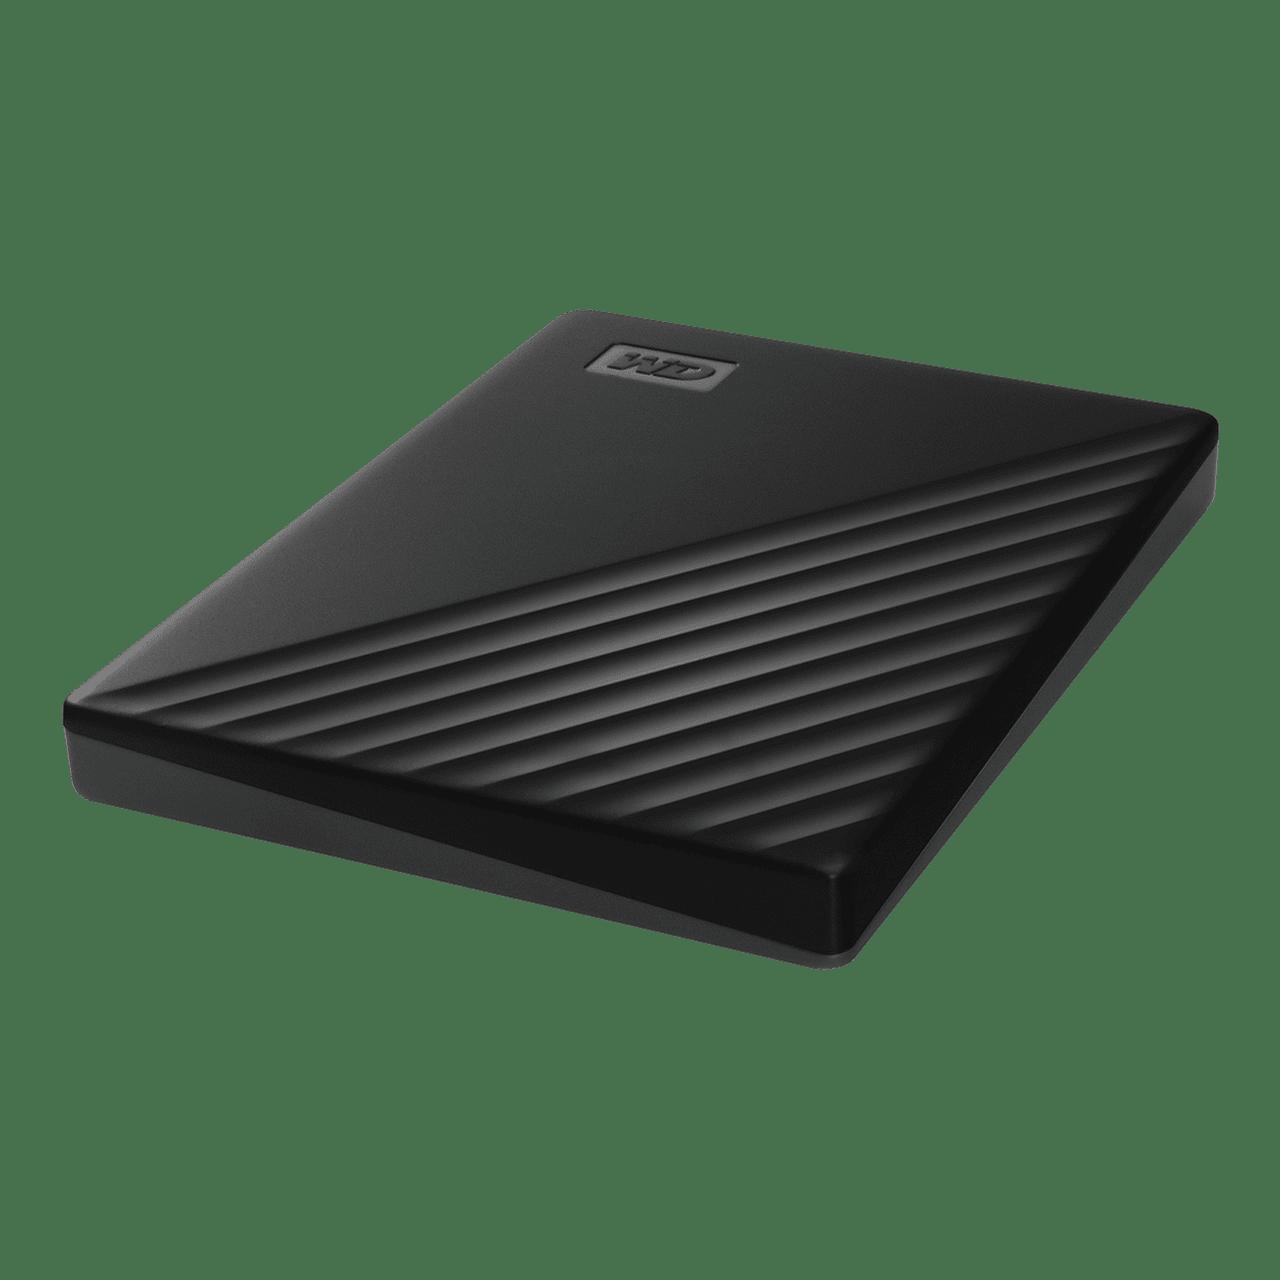 MyPassport 1-2 TB Black Overhead